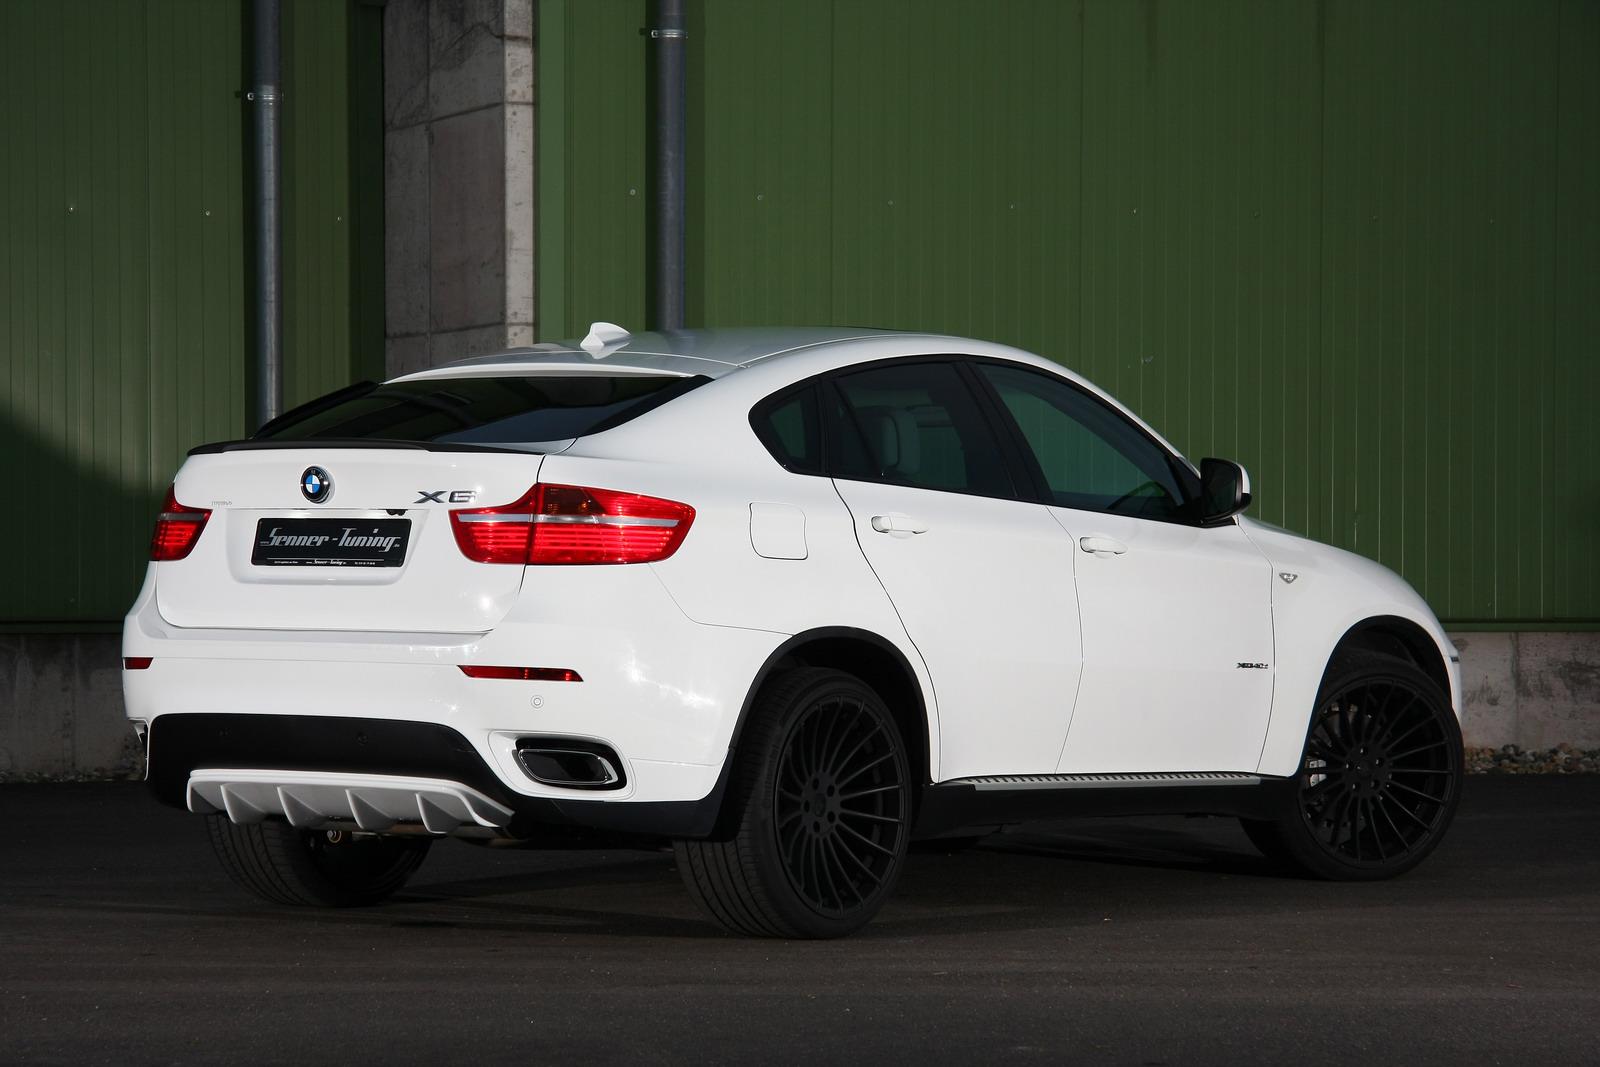 Naftové BMW X6 od Senner Tuning 2